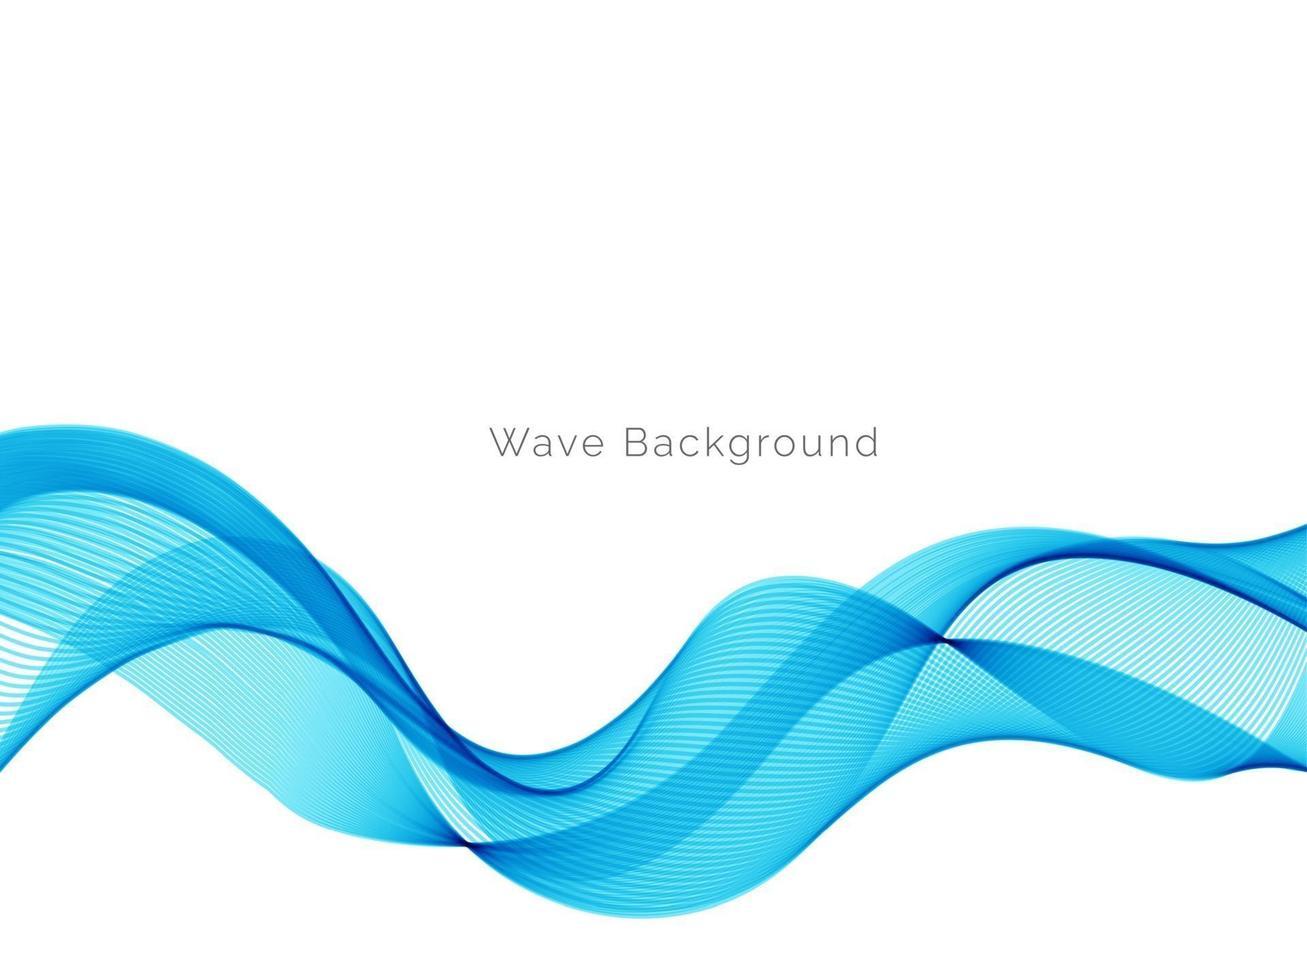 soepele stijlvolle vloeiende blauwe golf achtergrond vector